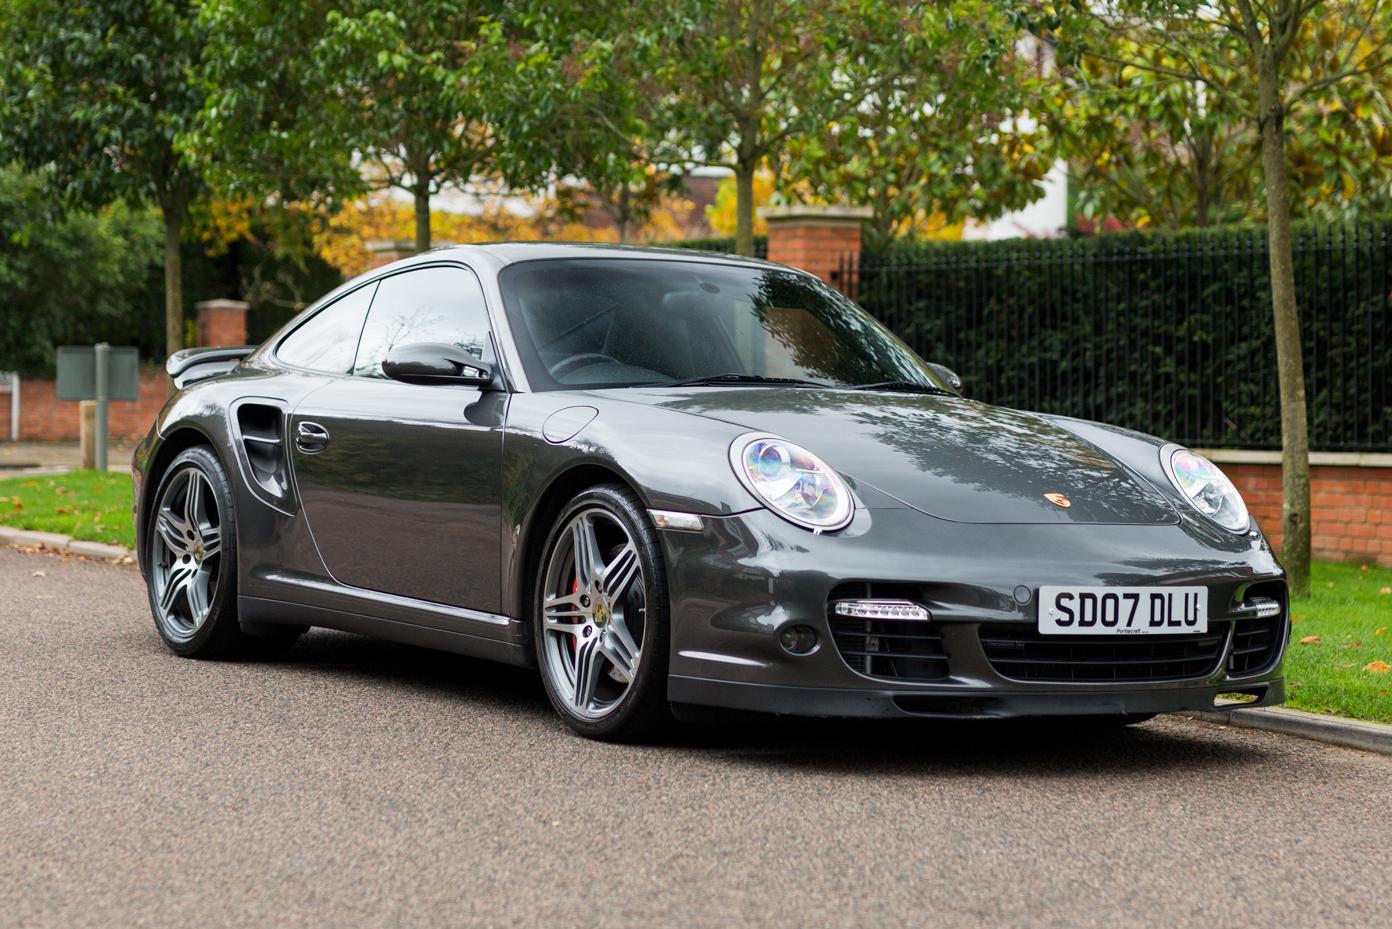 2007 Porsche 911 997 Turbo